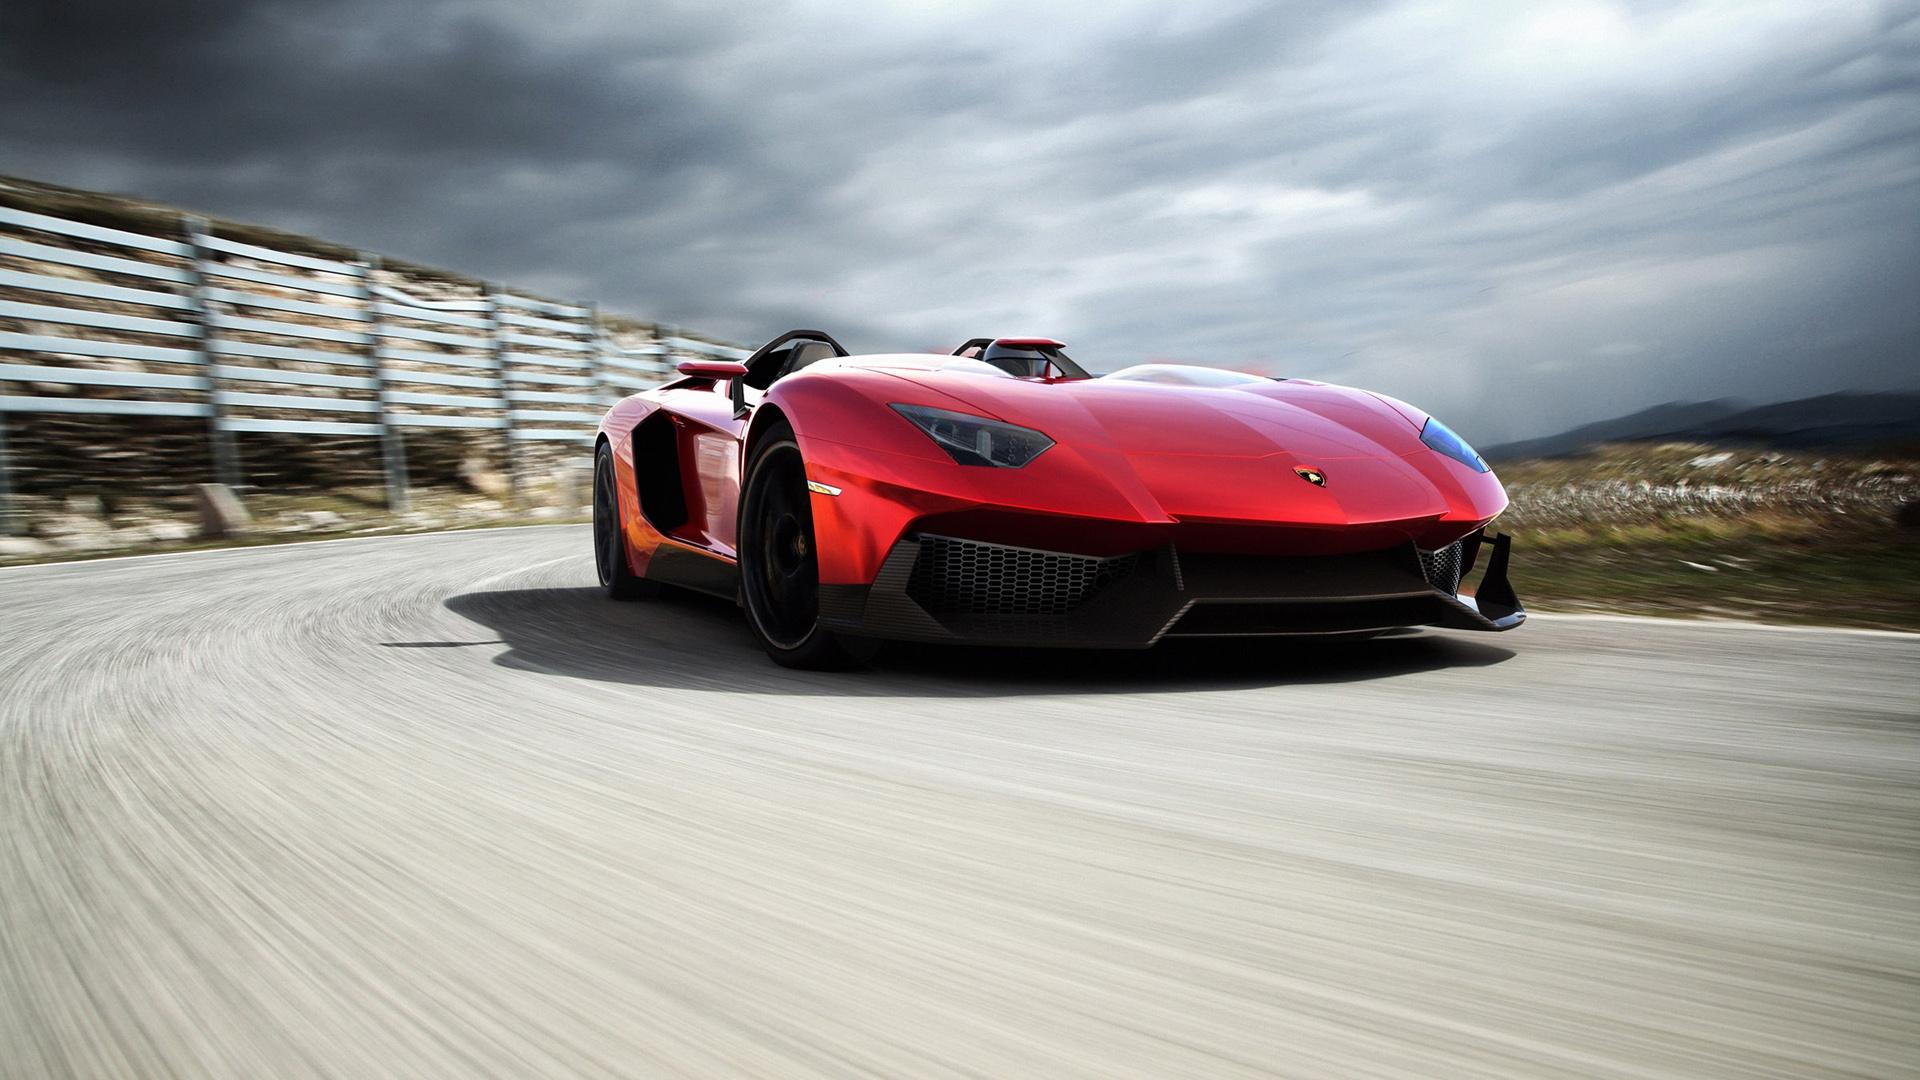 2012 Lamborghini Aventador J Speed - High Definition ...